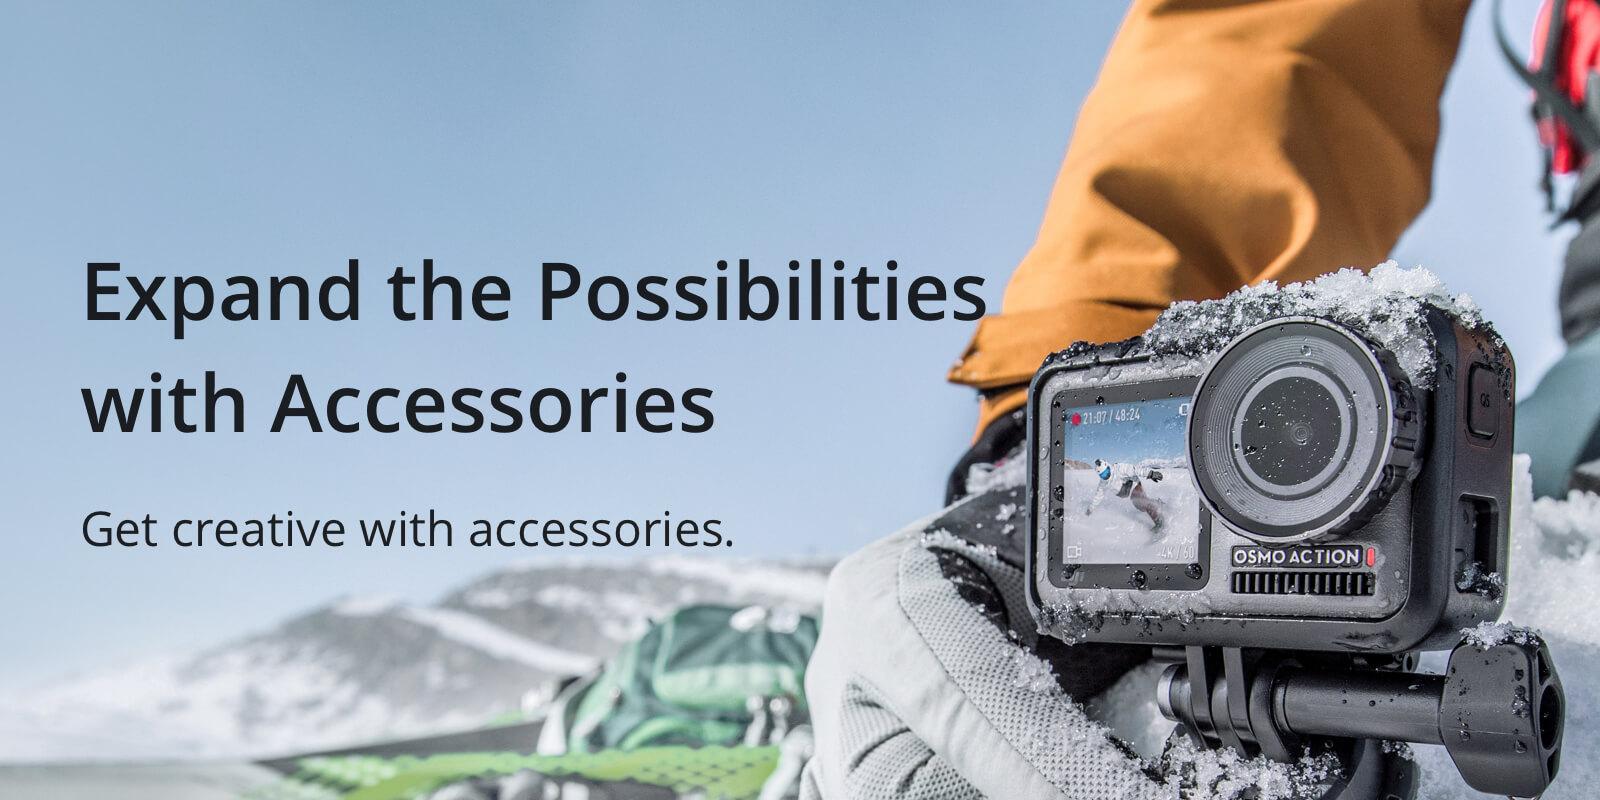 Cd Rek Accessoires.Dji Osmo Action Kamera Promaksa